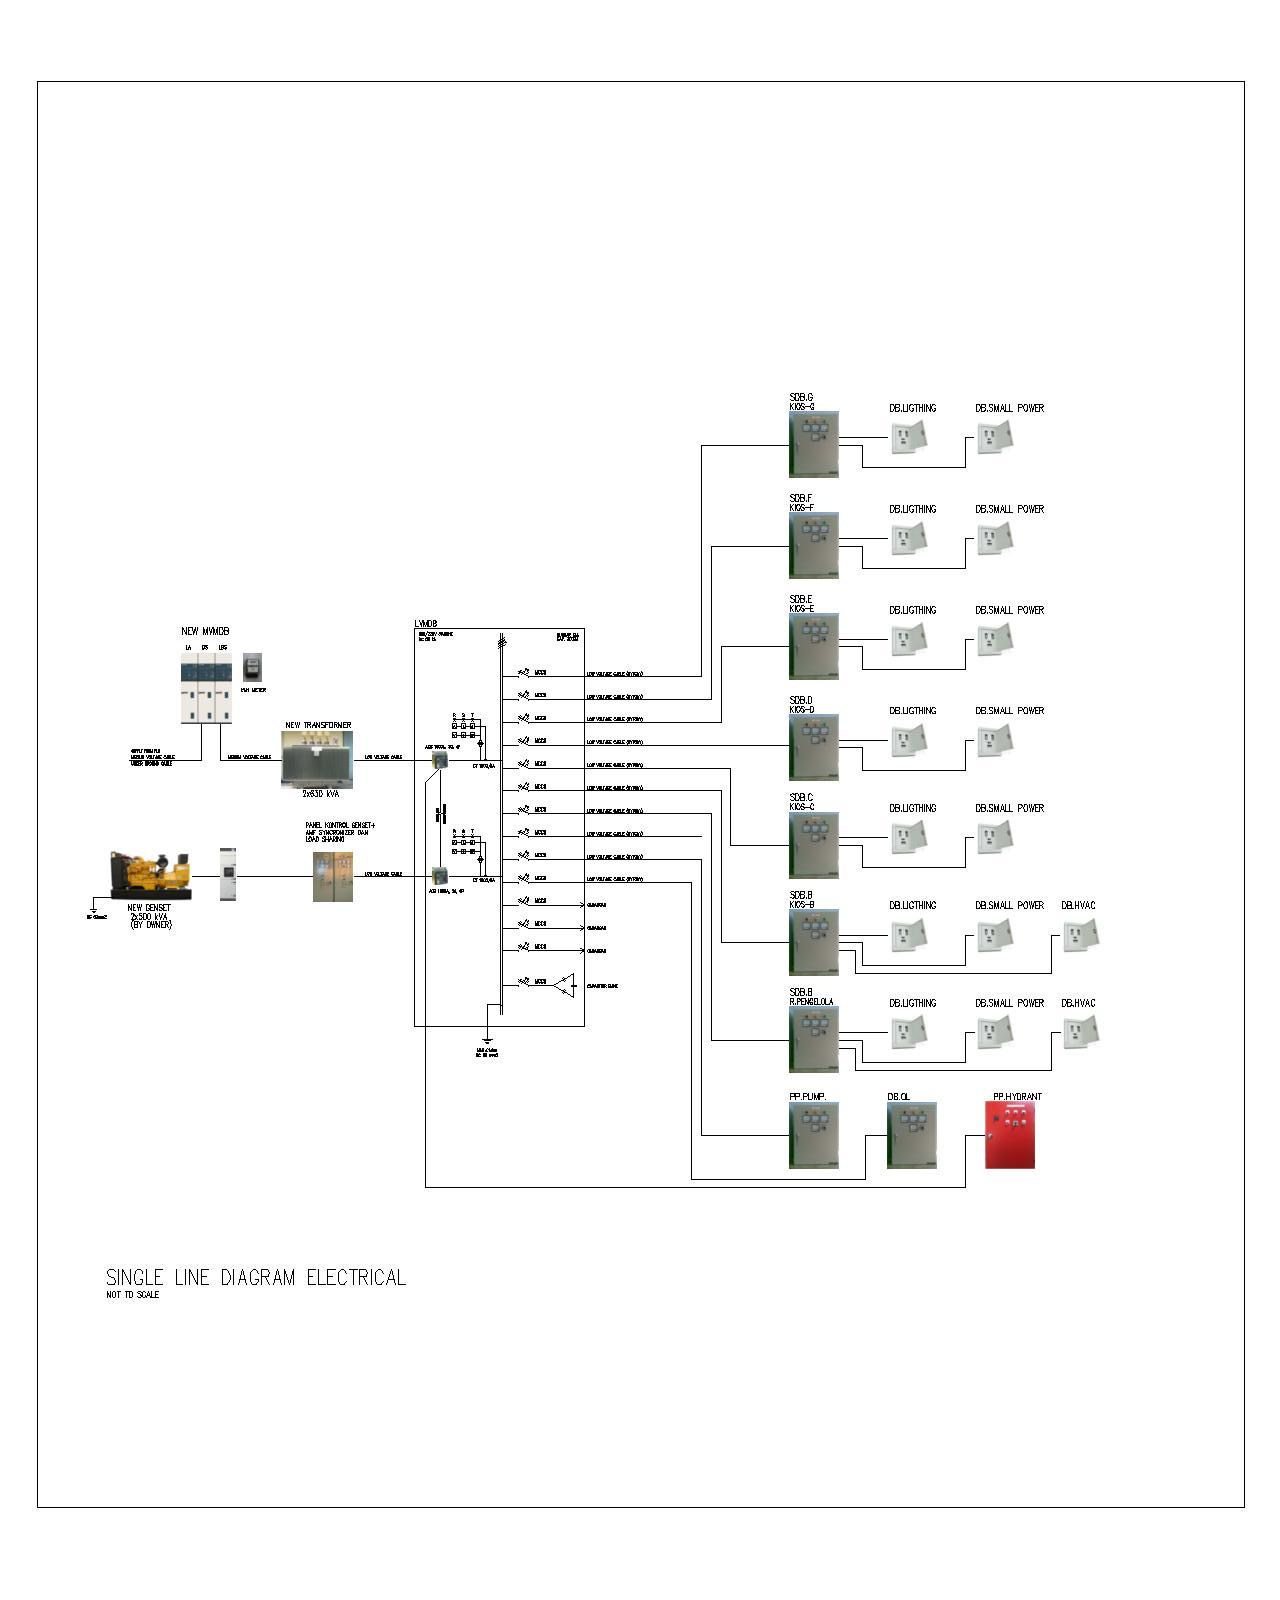 2000 audi a8 wiring diagram html